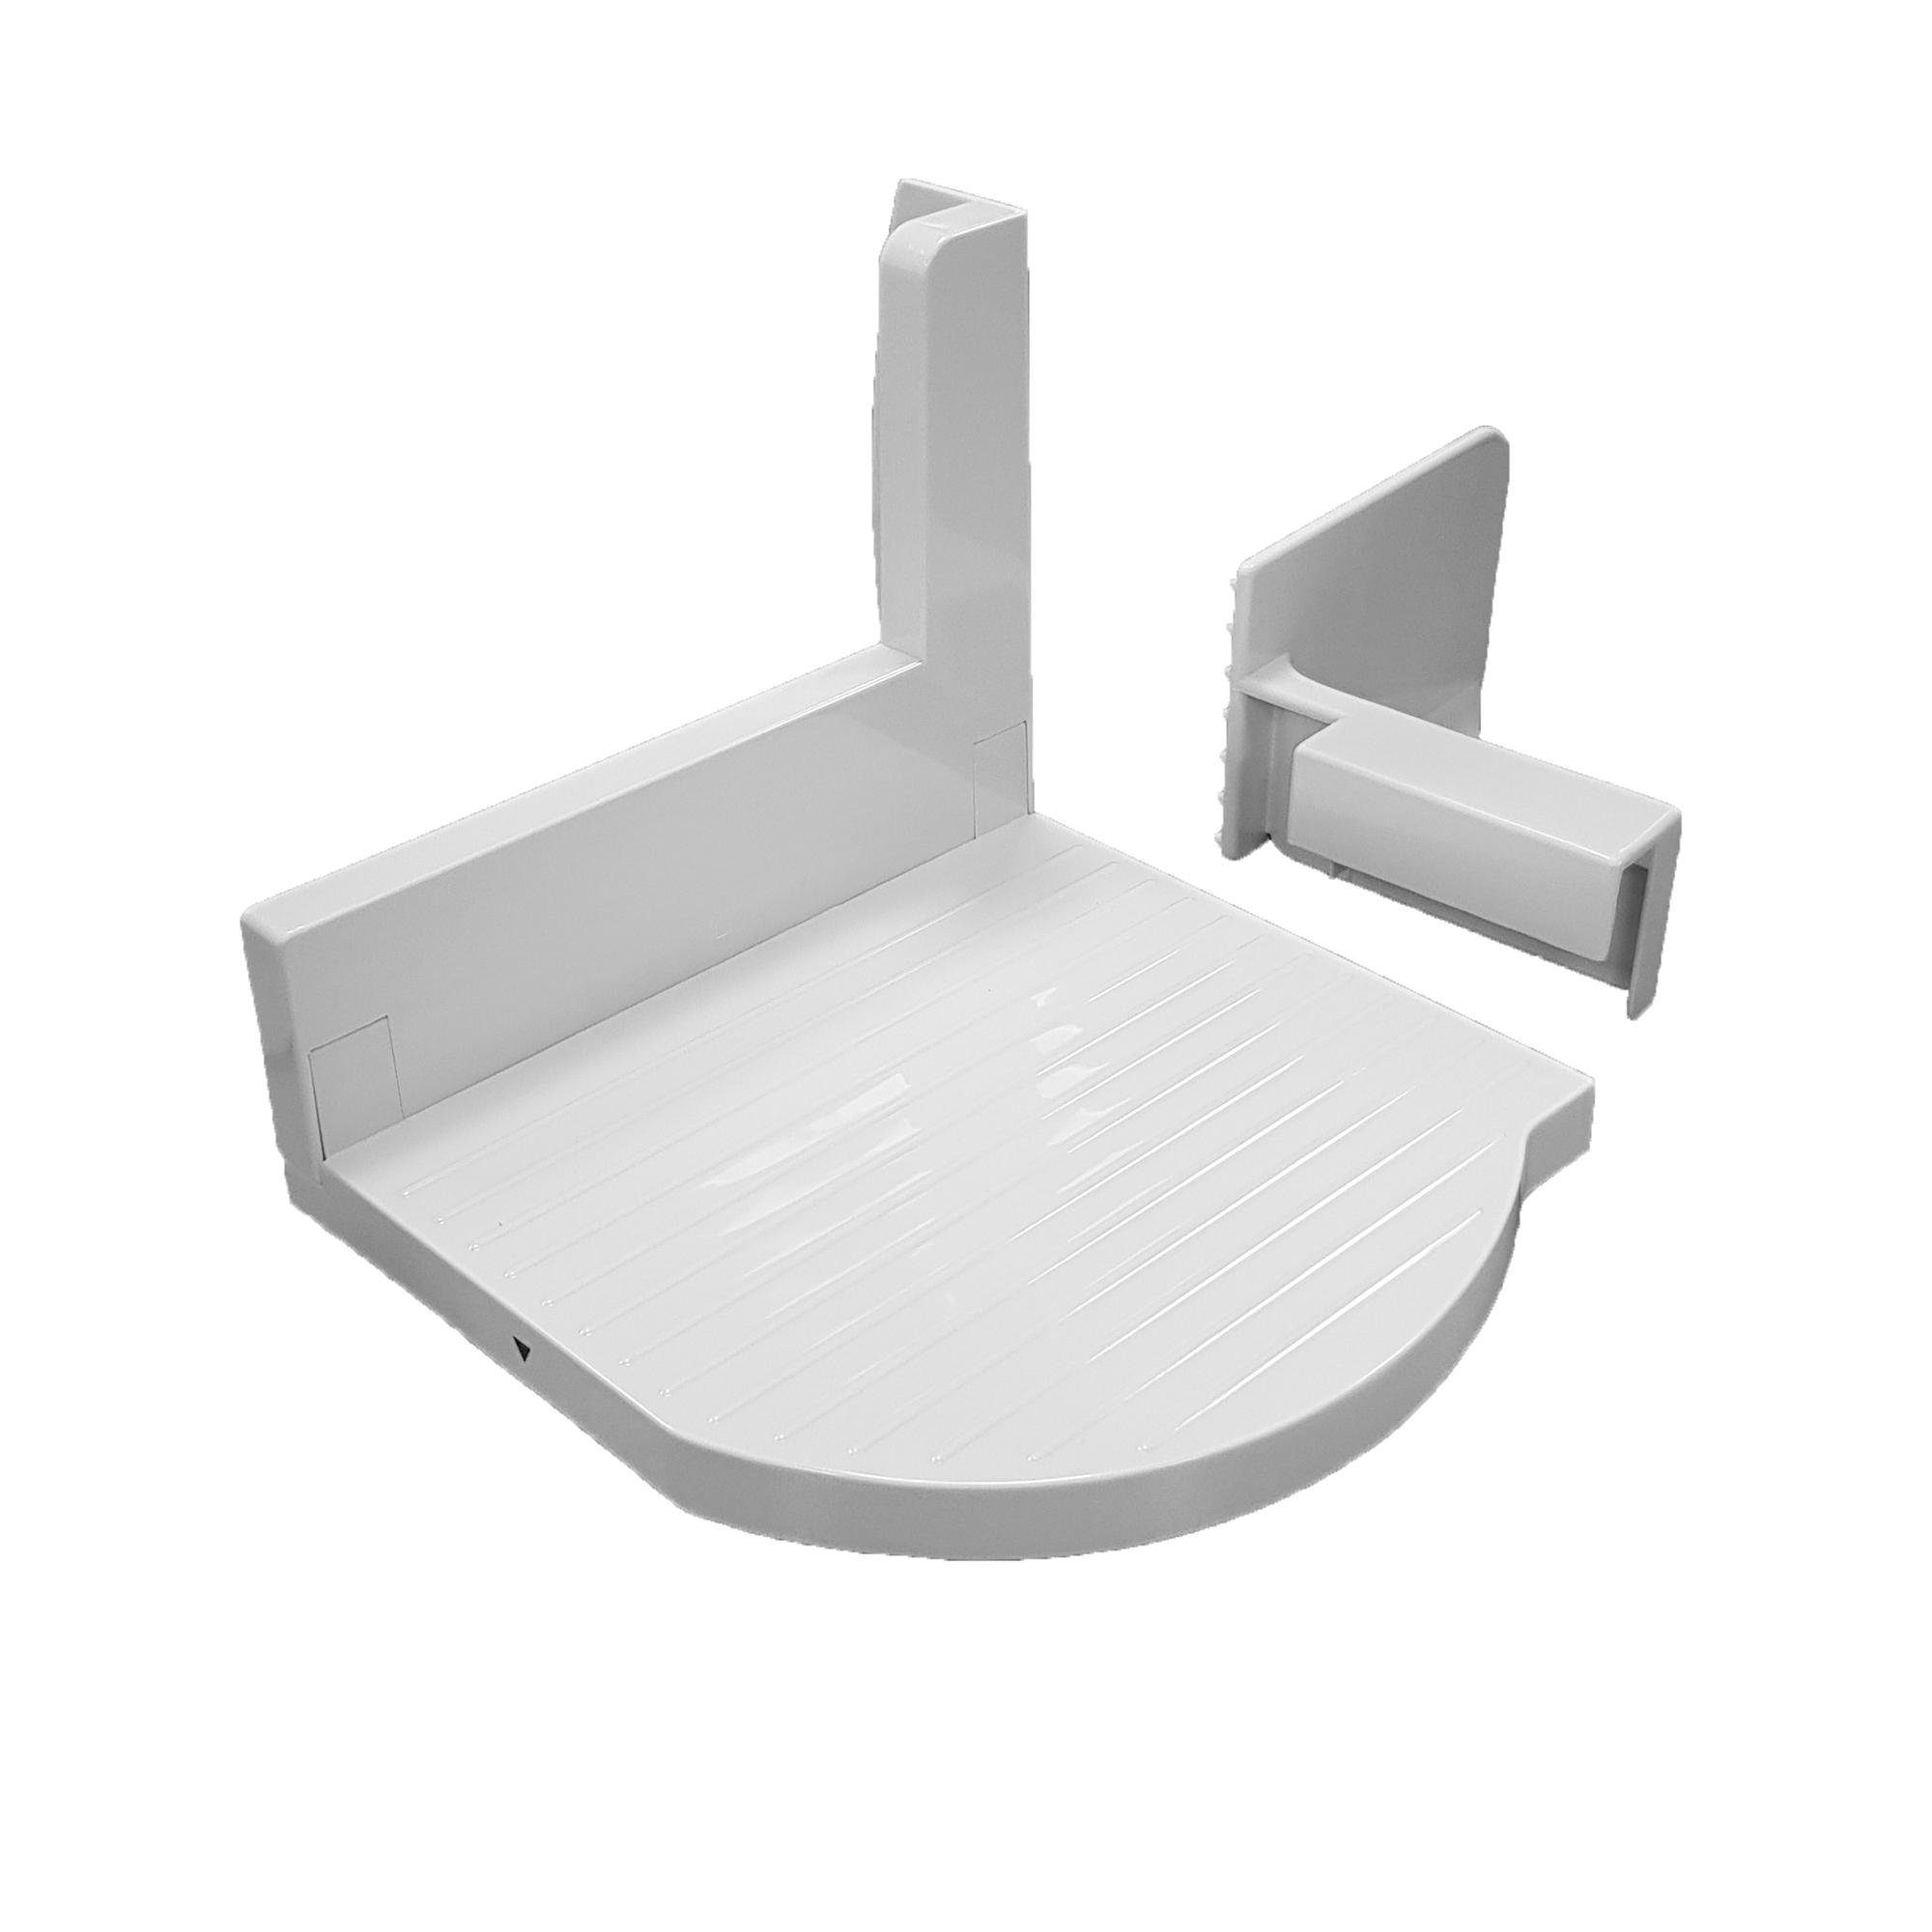 MPM MKR-03 Cortafiambres plegable blanco, grosor de corte ajustable 15mm, disco corte 17 cm, 150 W